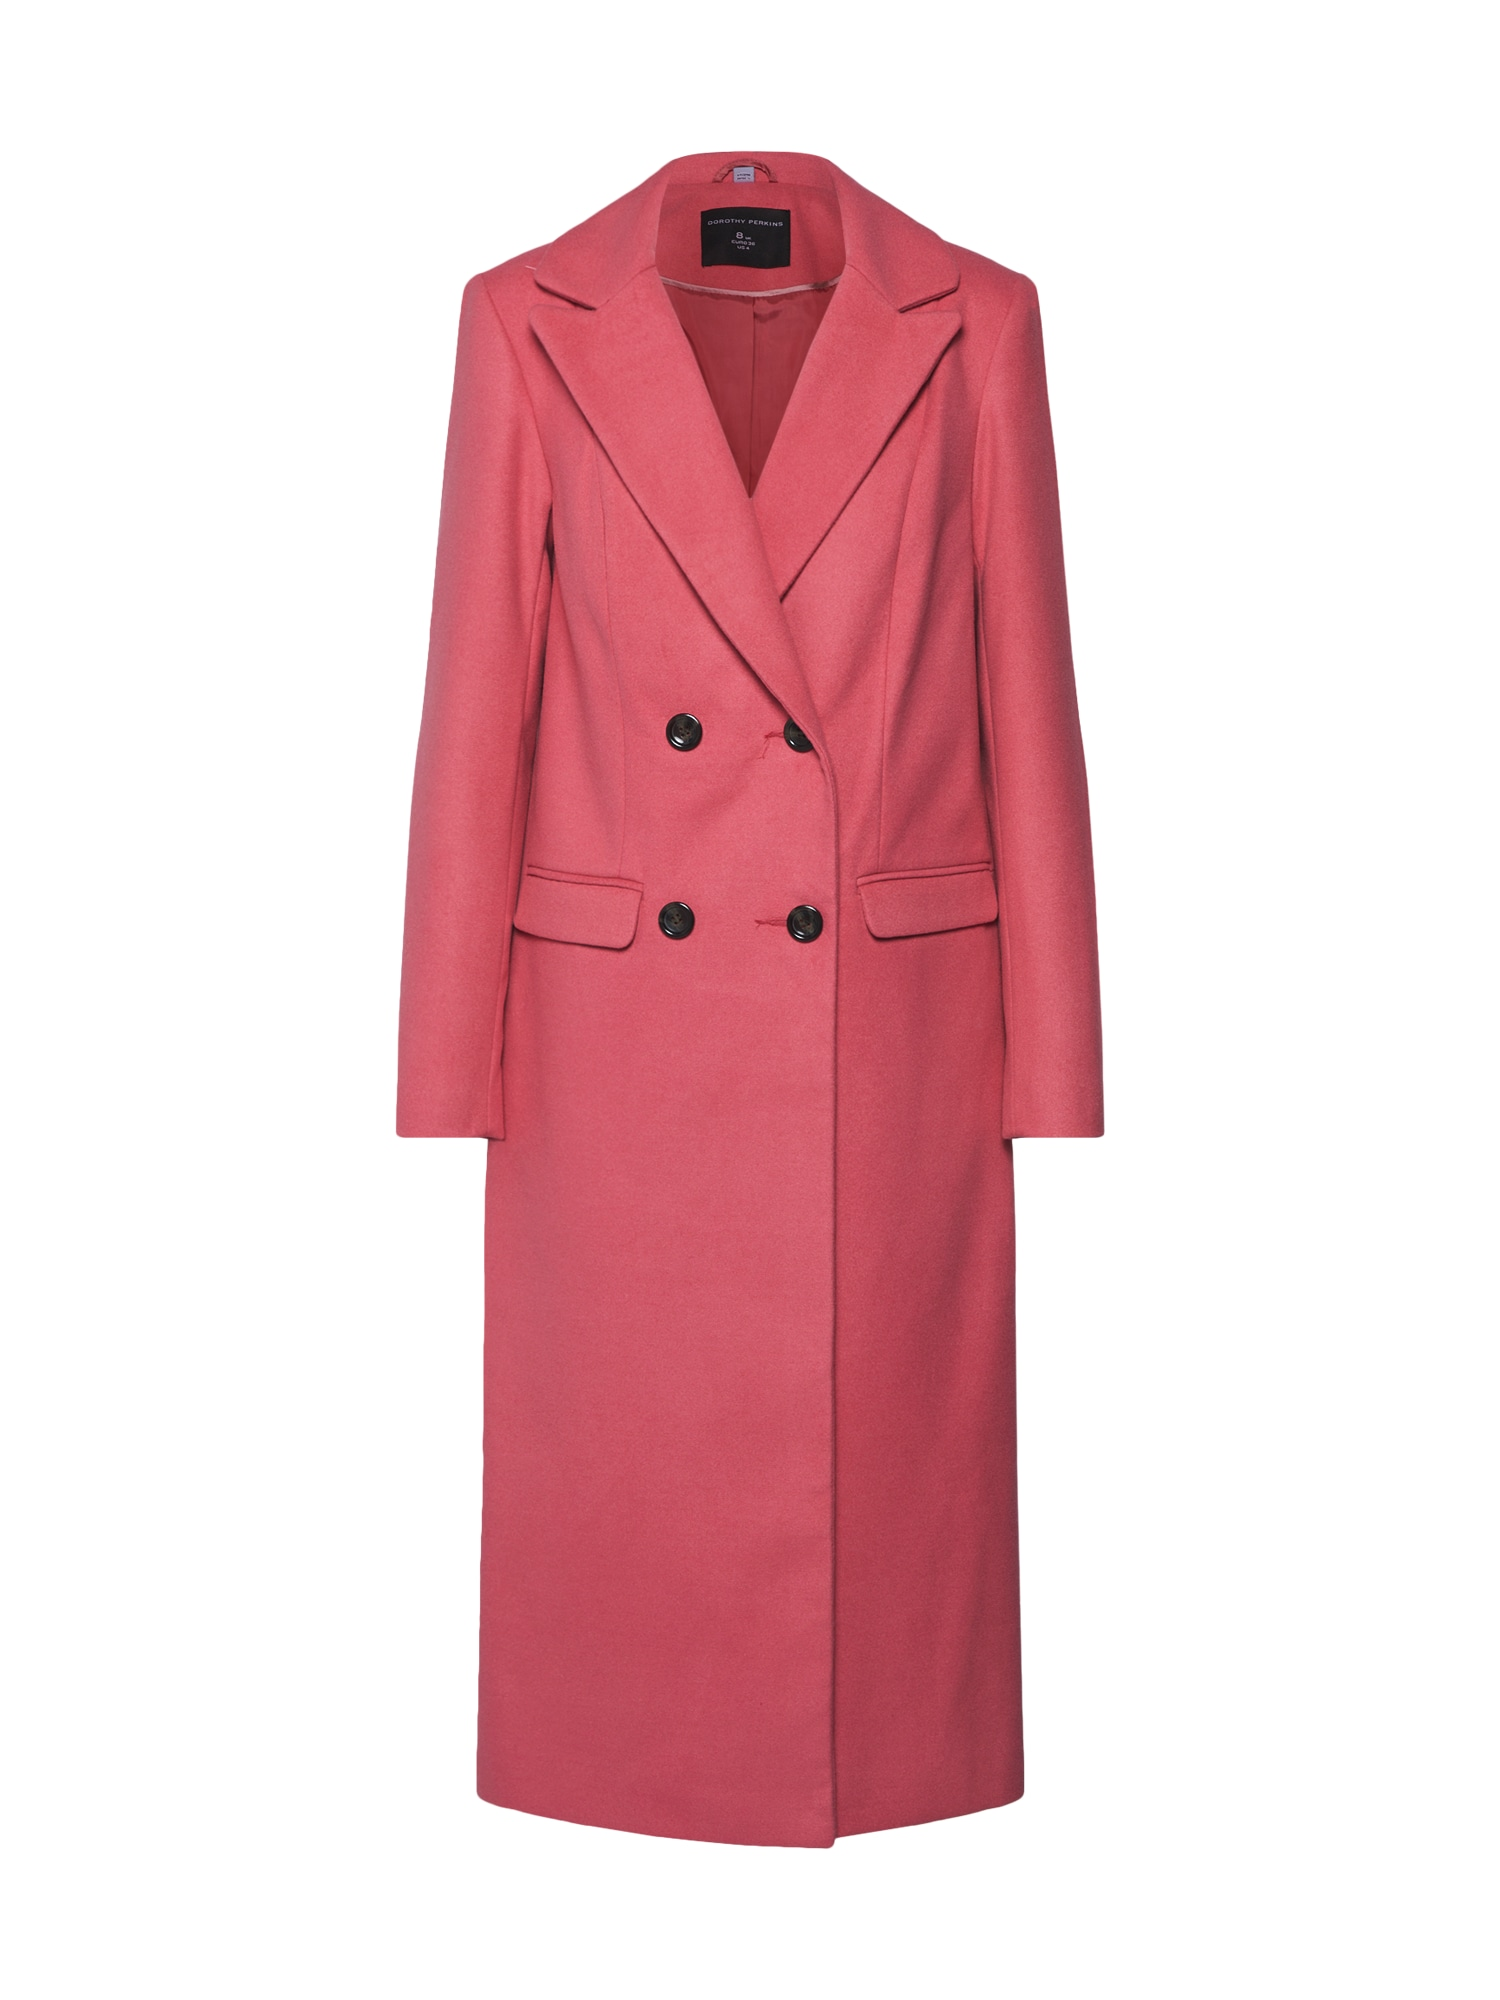 Přechodný kabát COLOUR CROMBIE pink Dorothy Perkins